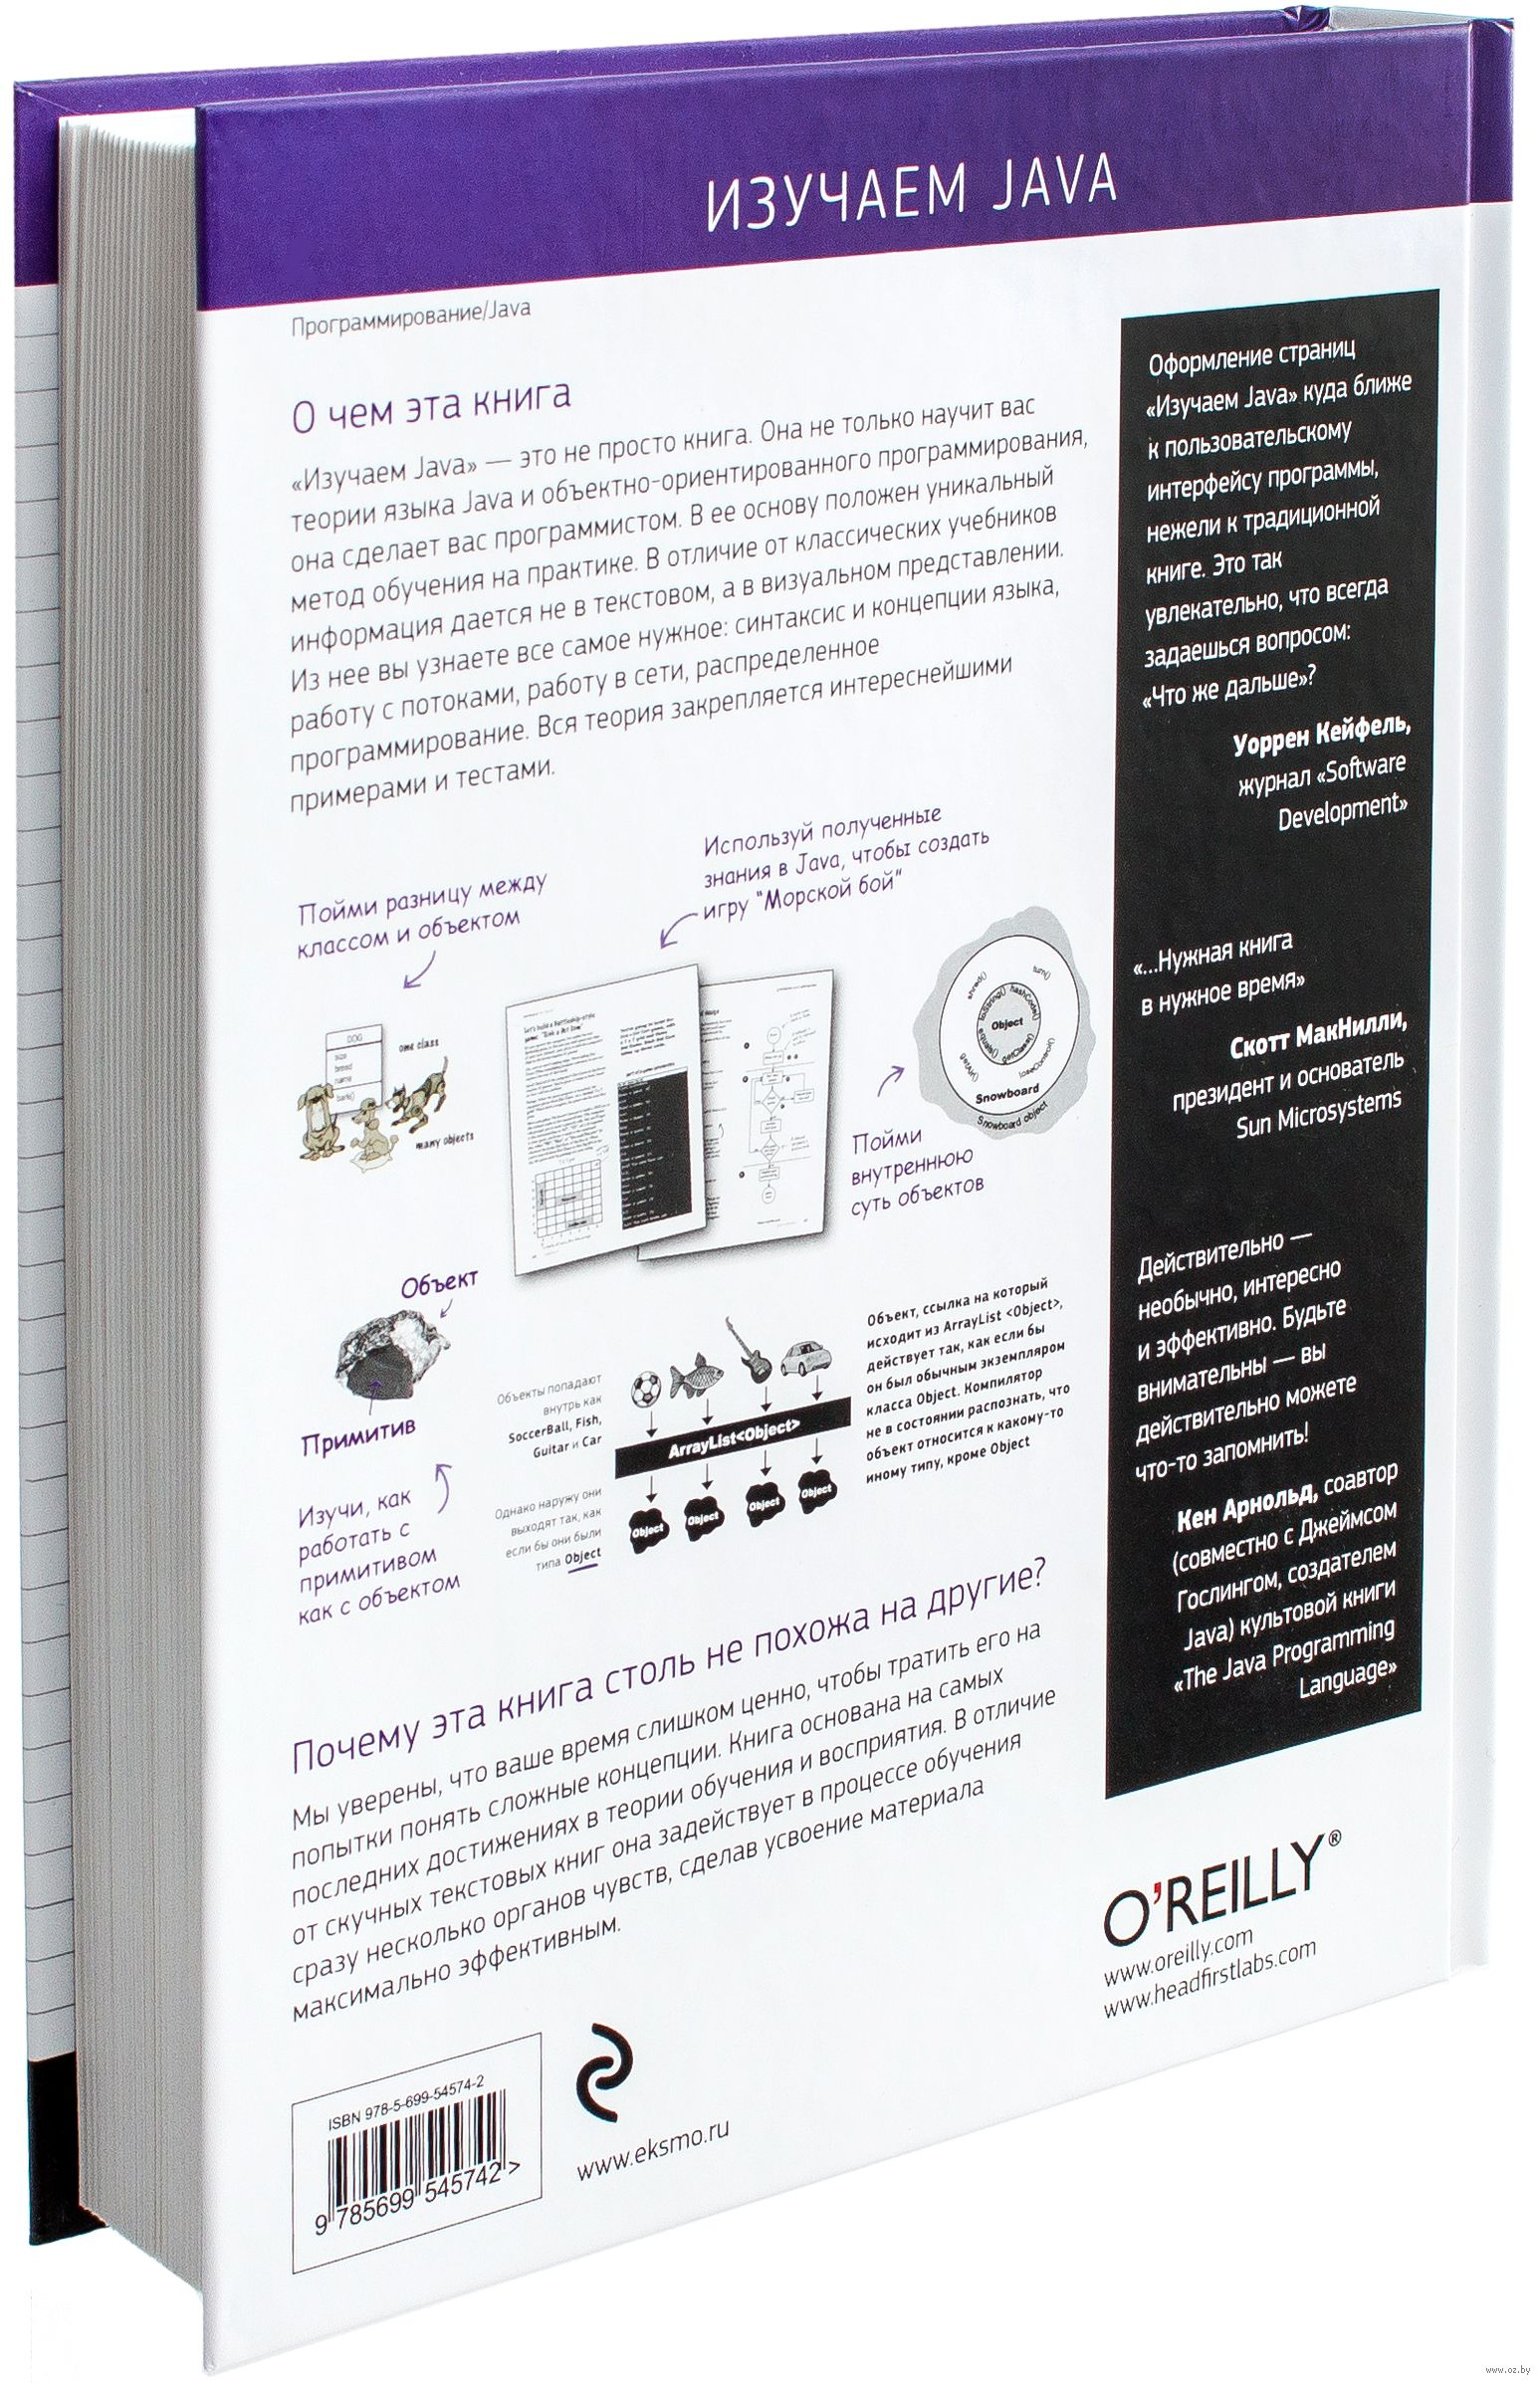 изучаем java 2-е издание pdf